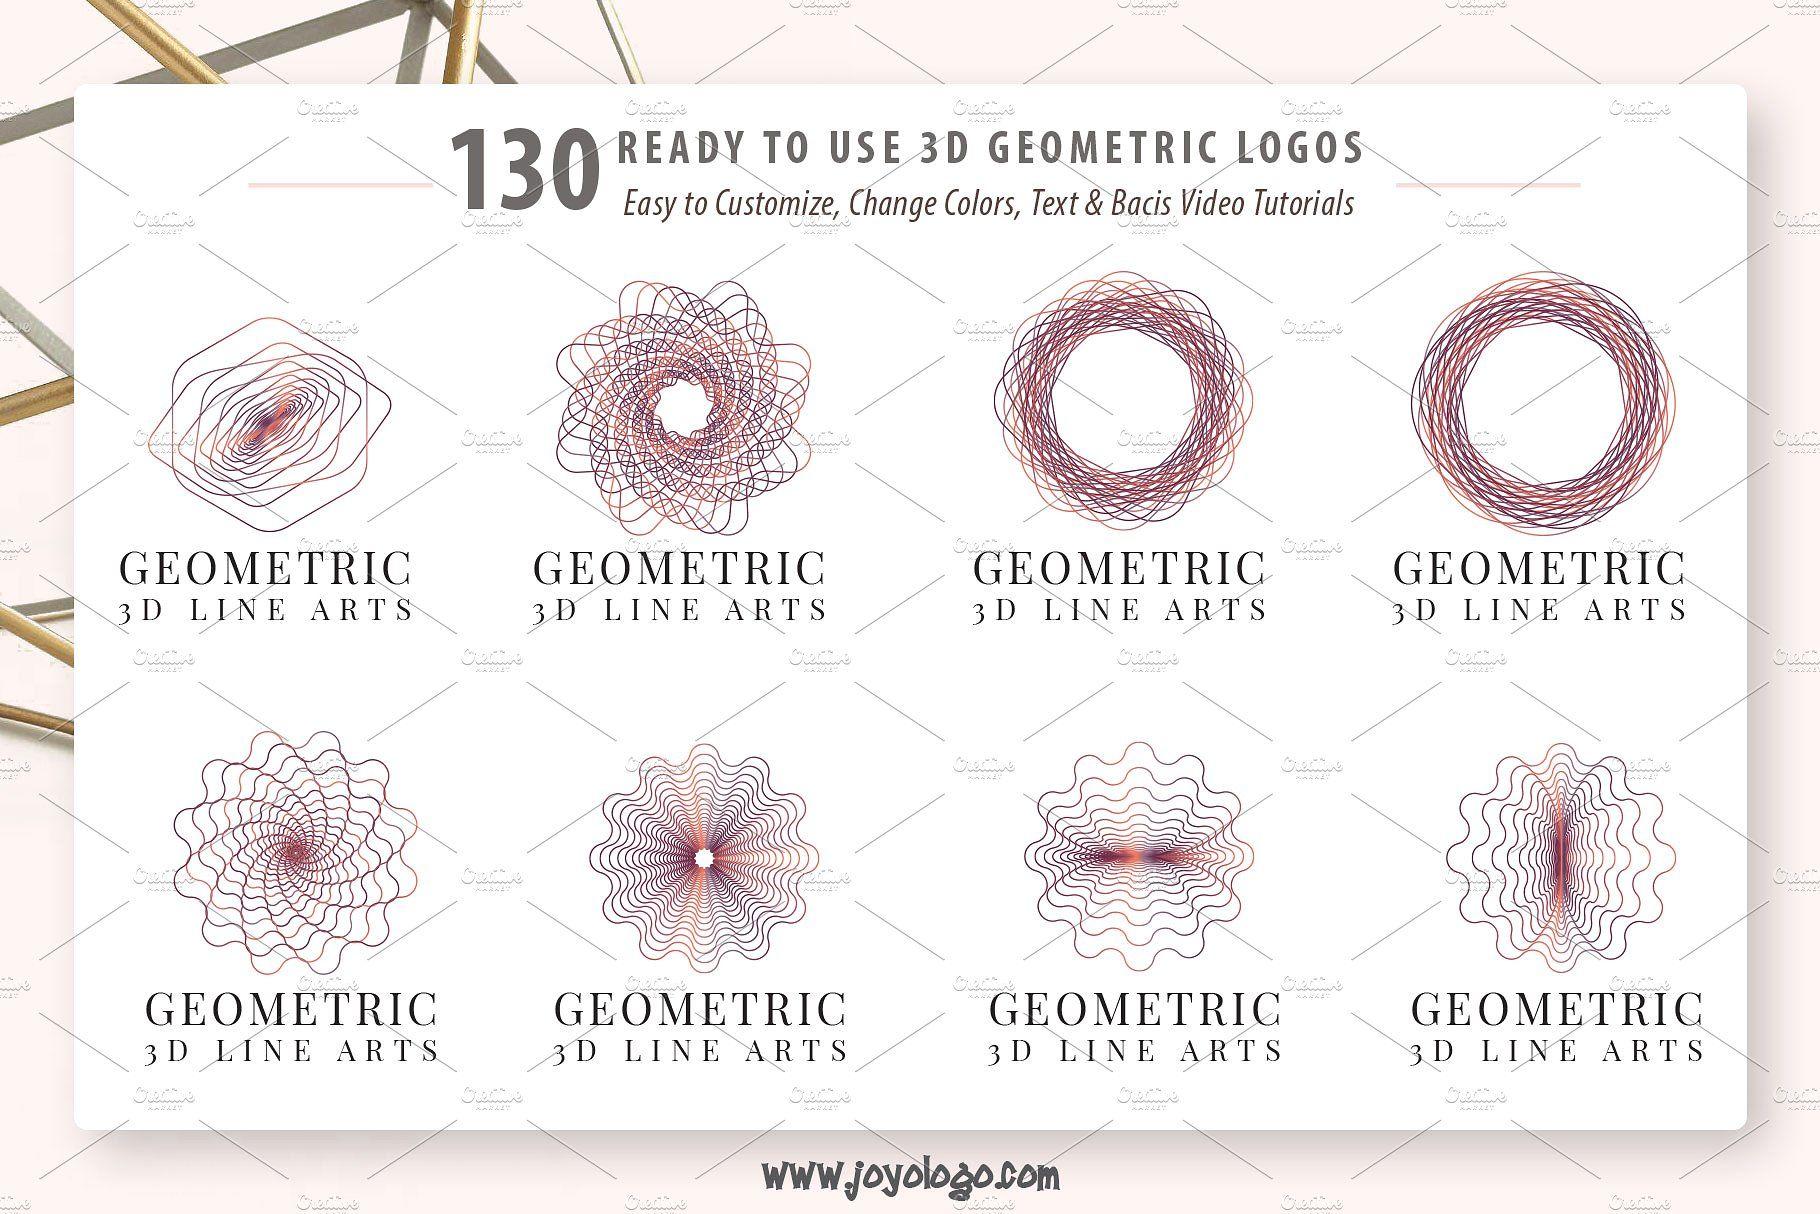 Geometric Logo Generator 3D Line Art #files#open#graphic